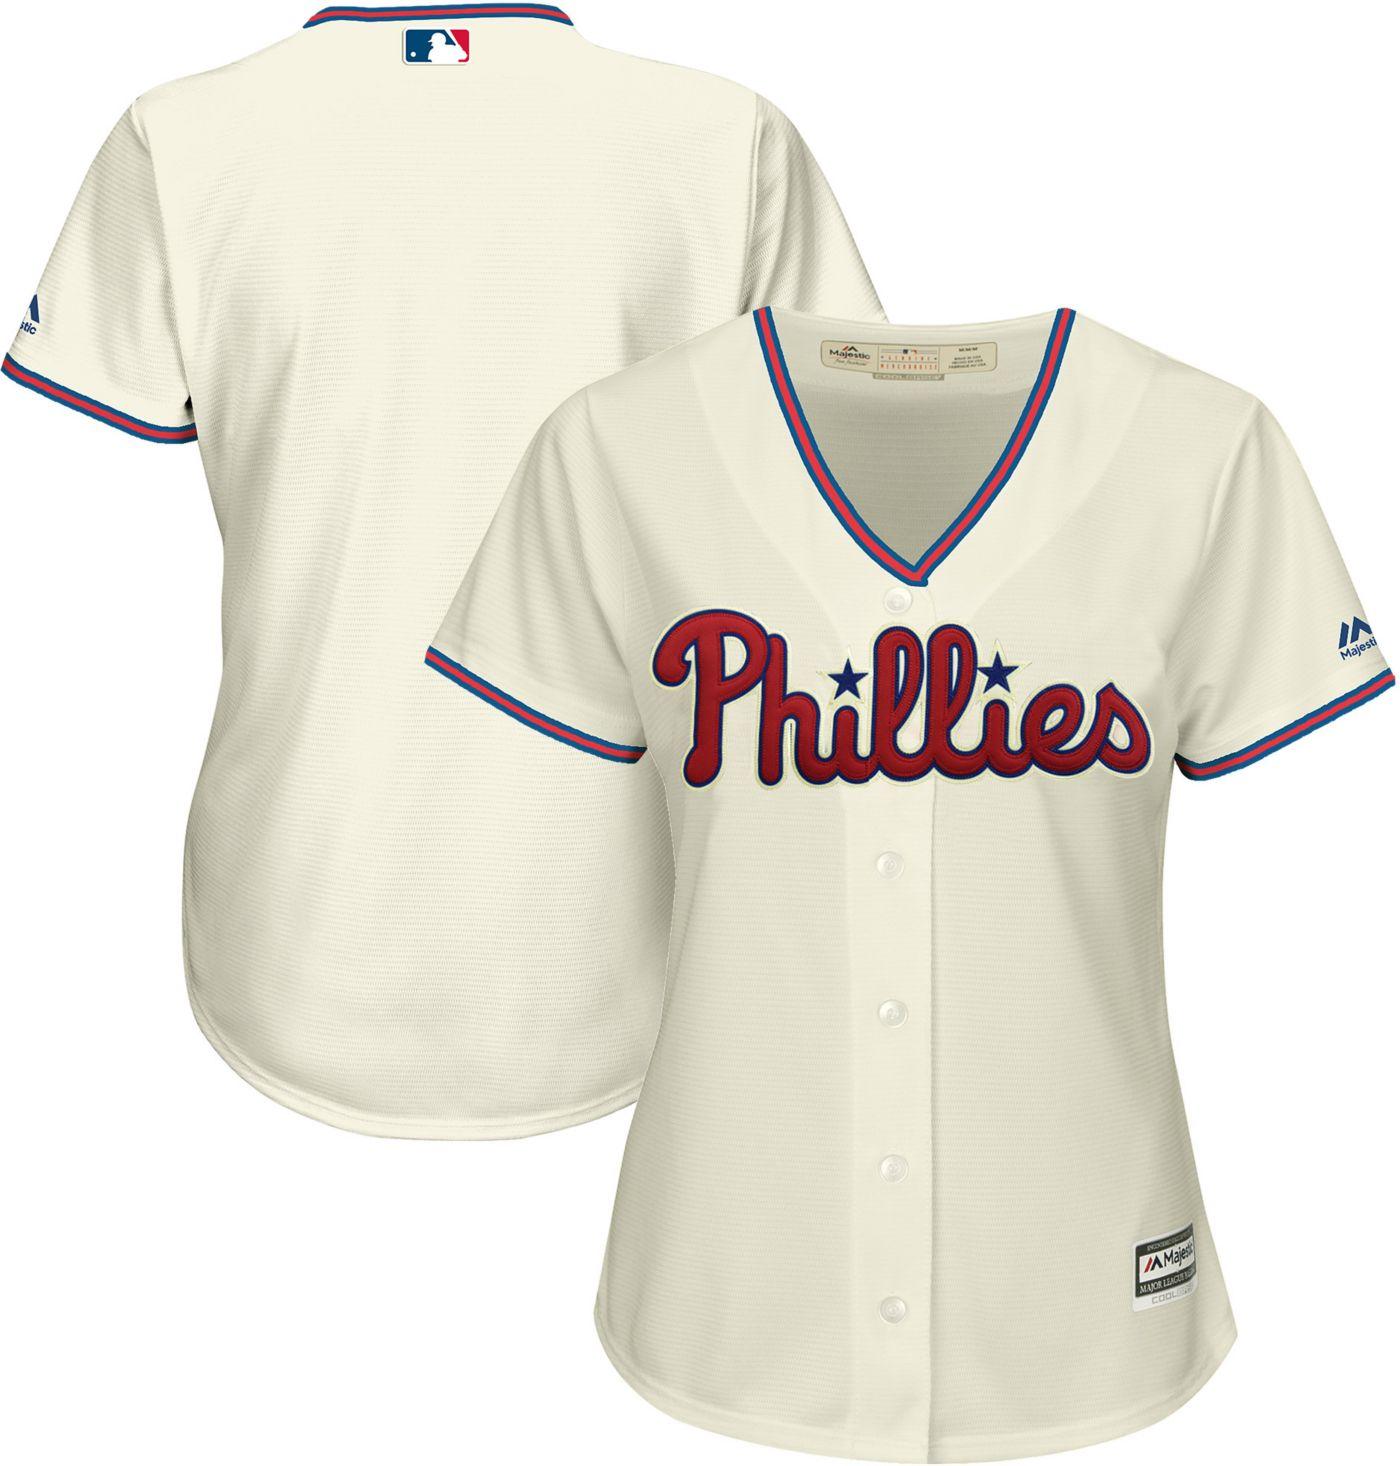 Majestic Women's Replica Philadelphia Phillies Cool Base Alternate Ivory Jersey